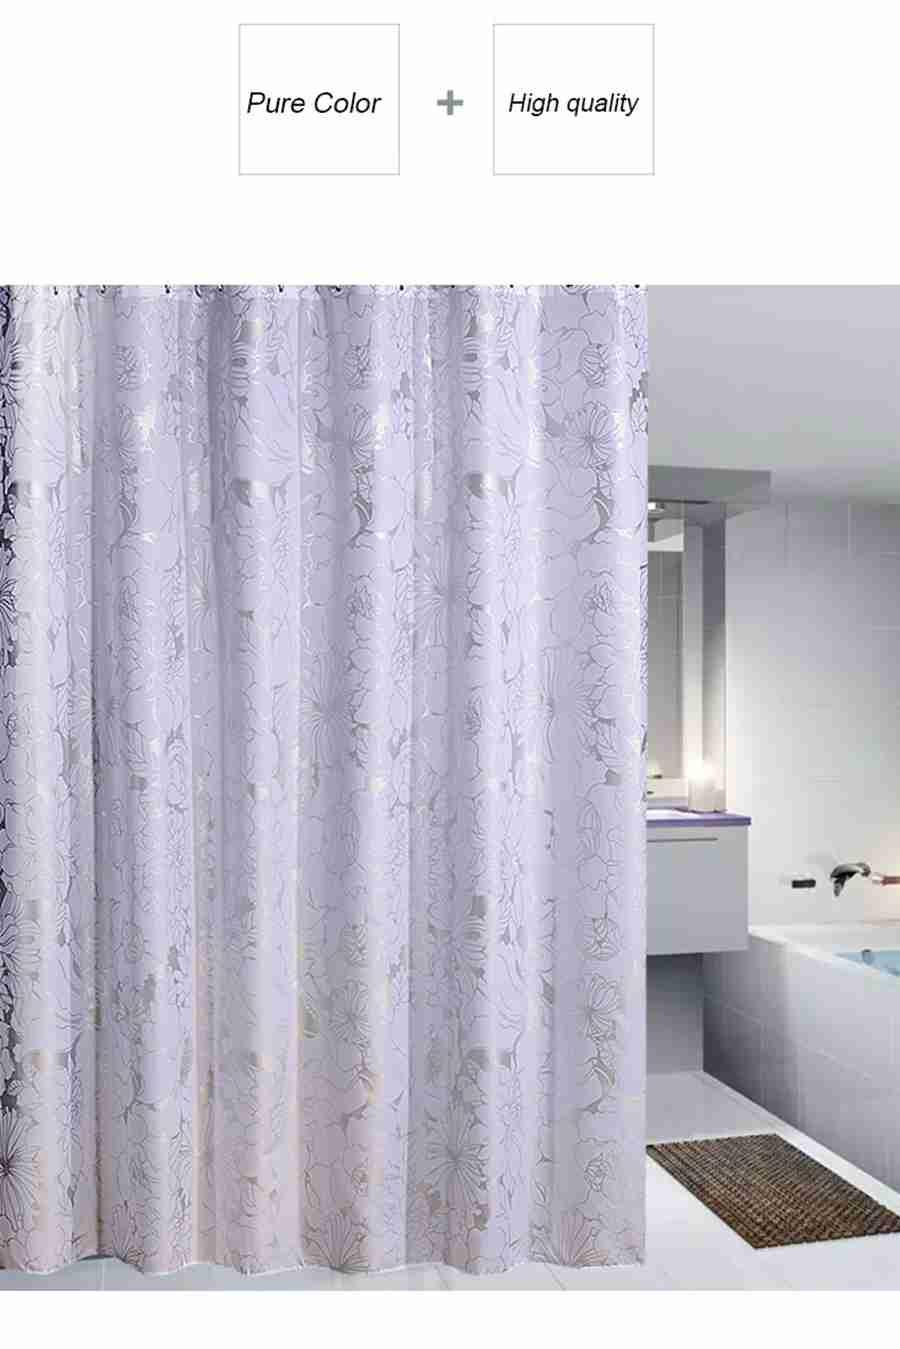 Waterproof Shower Curtain 1 Bath For Bathroom 2